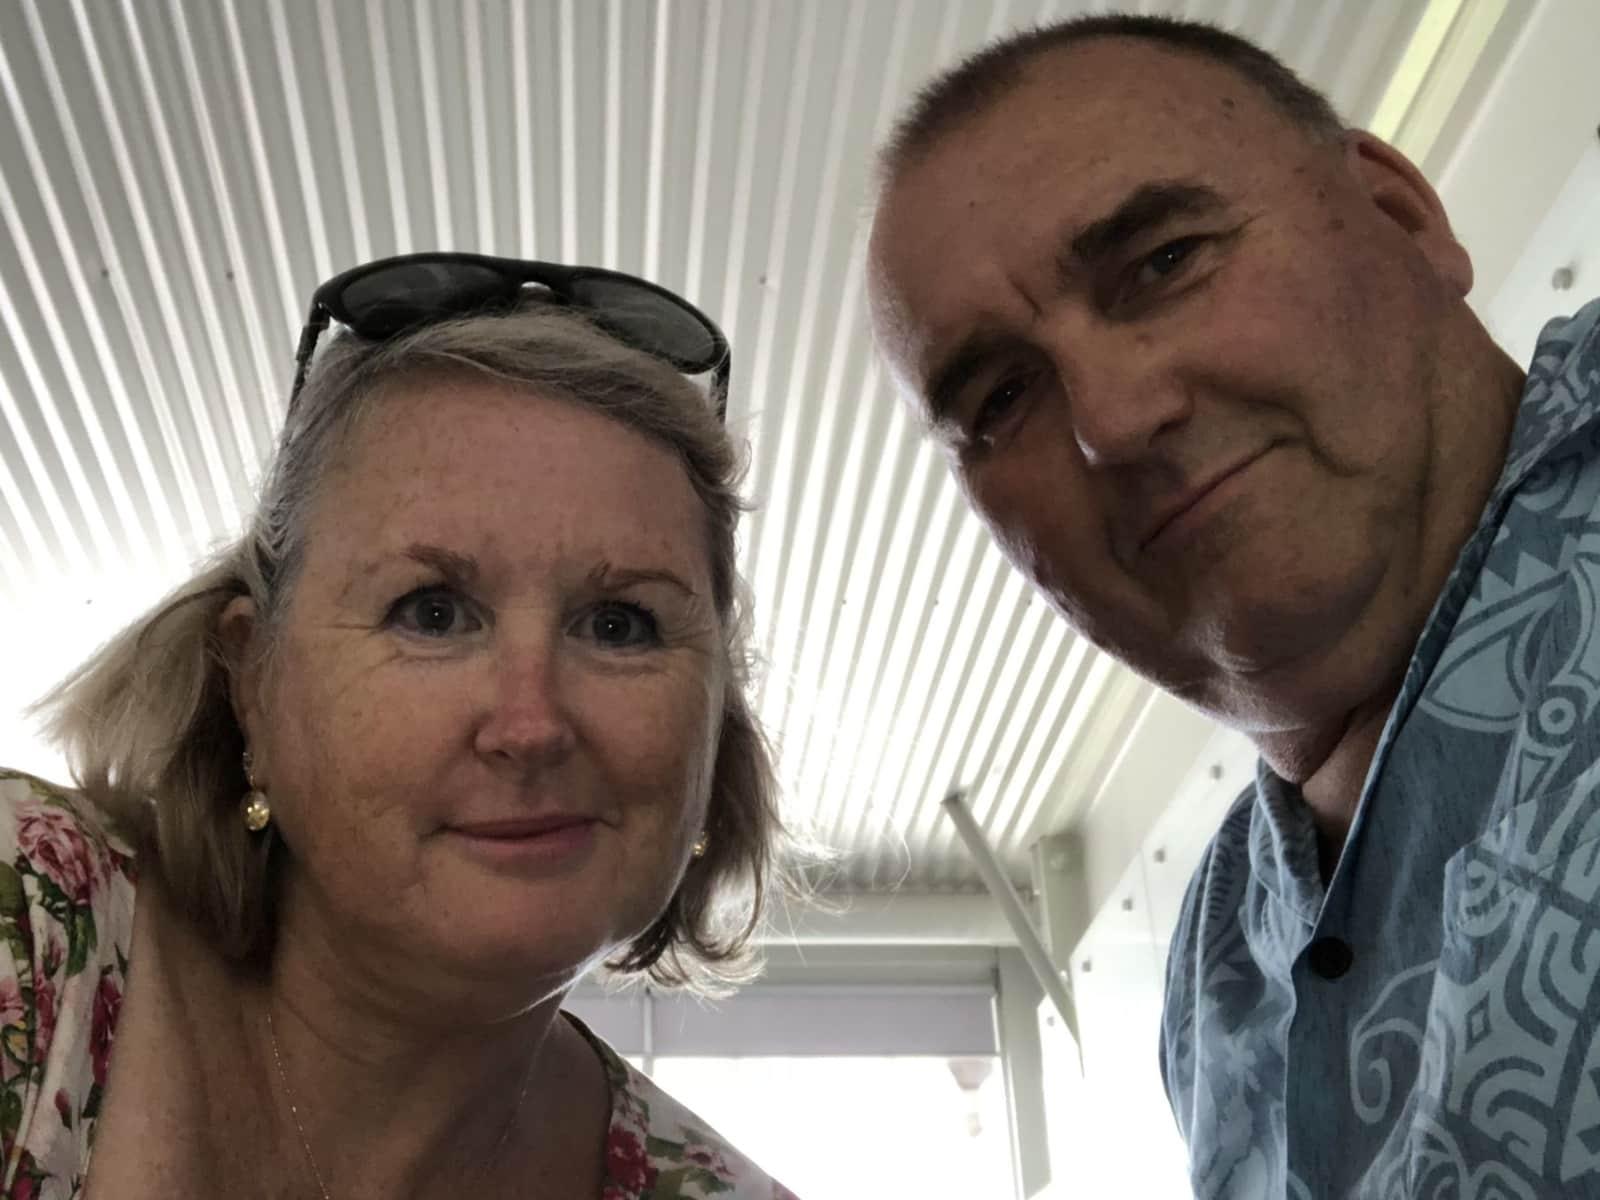 Desiree & Jeff from Gold Coast, Queensland, Australia